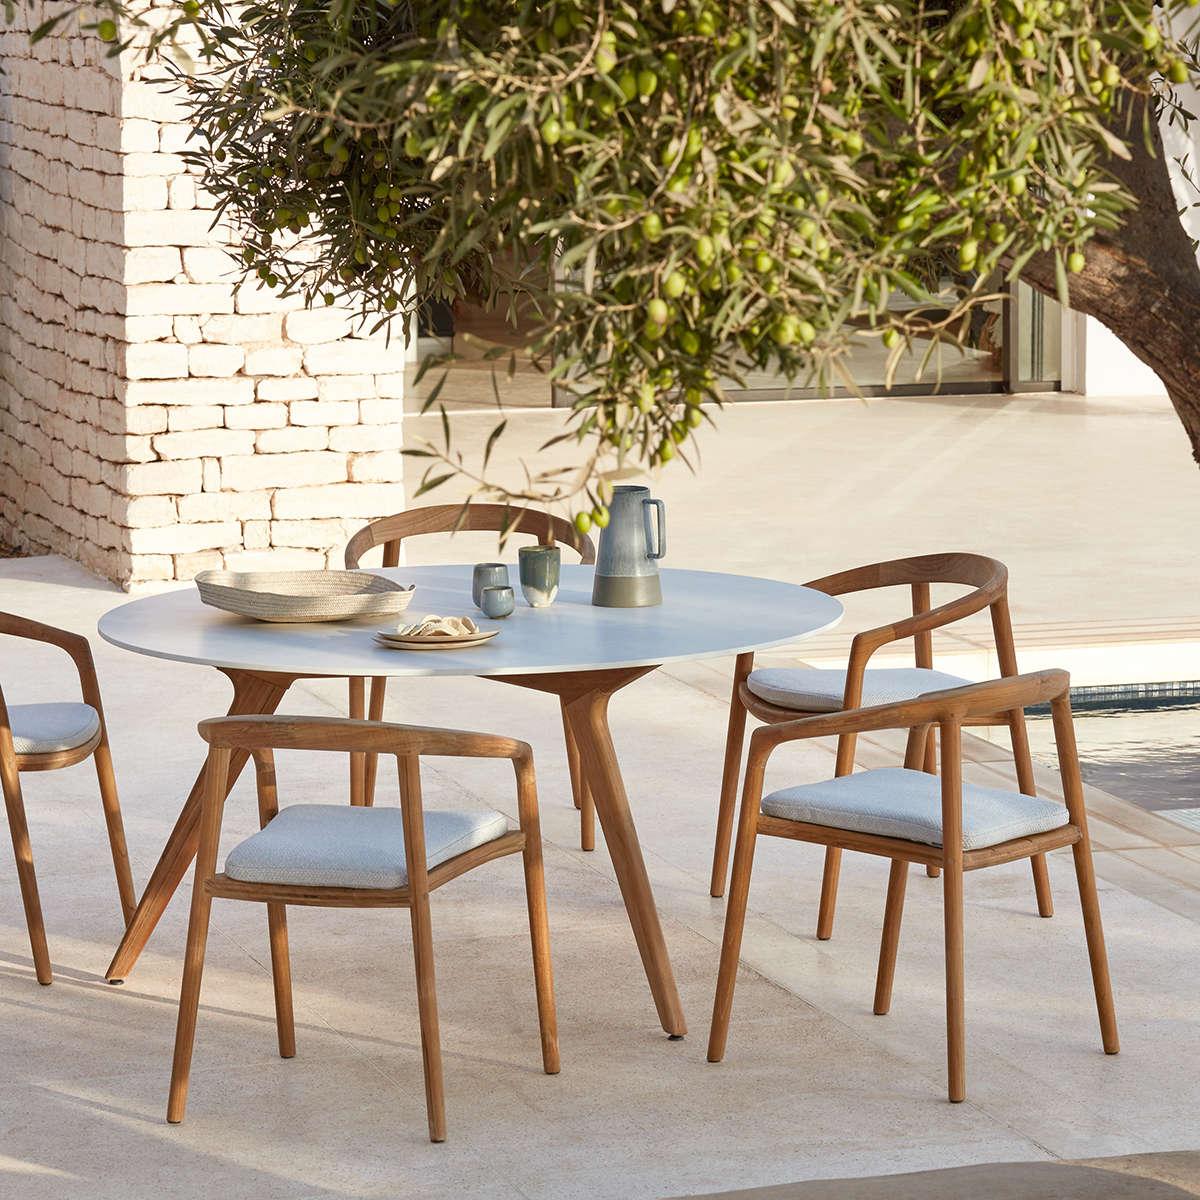 Manutti Torsa Dining Table Ambi 4